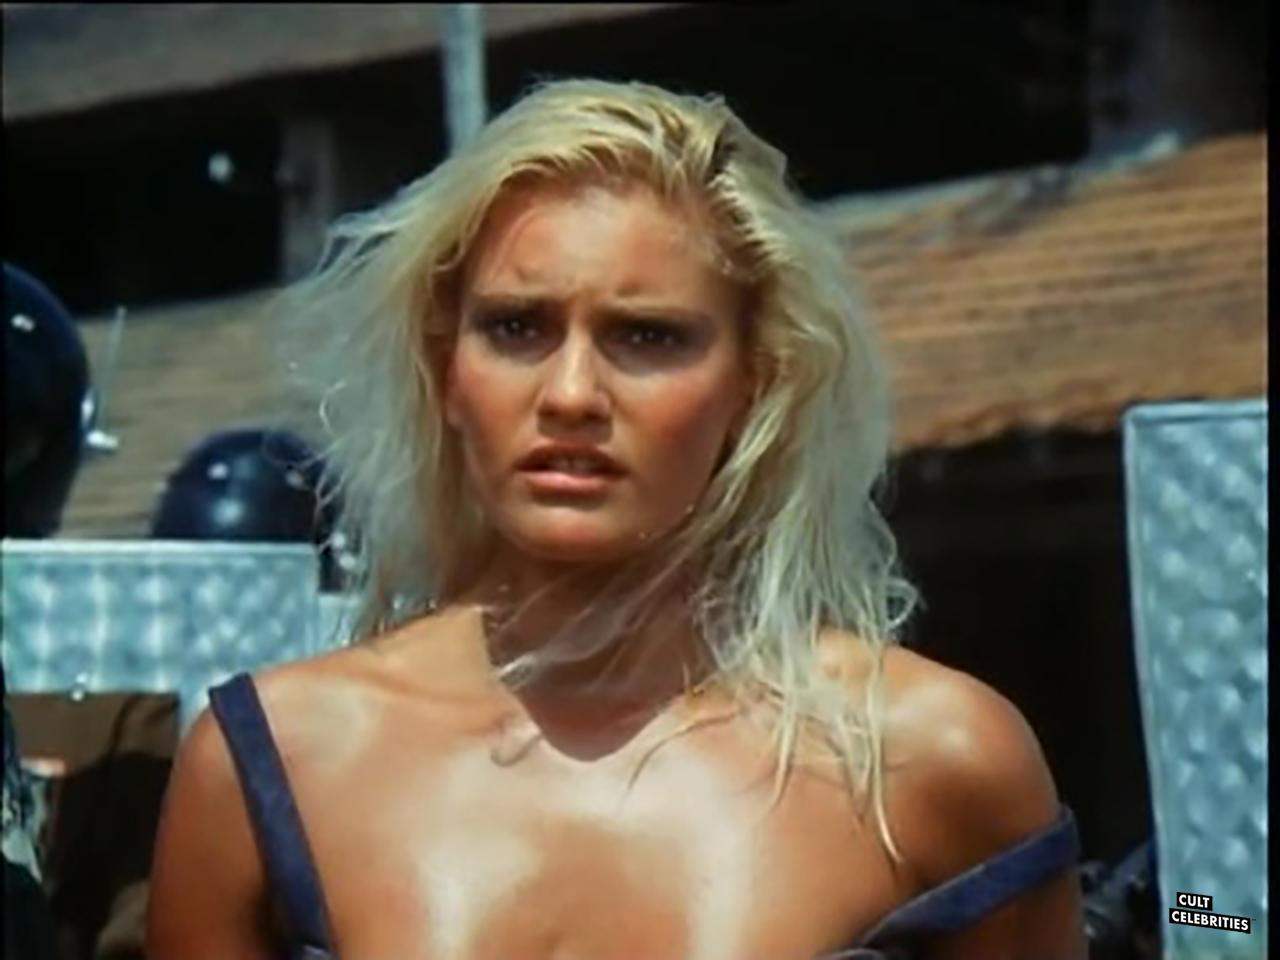 Sabrina Siani in 2020 Texas Gladiators (1982)